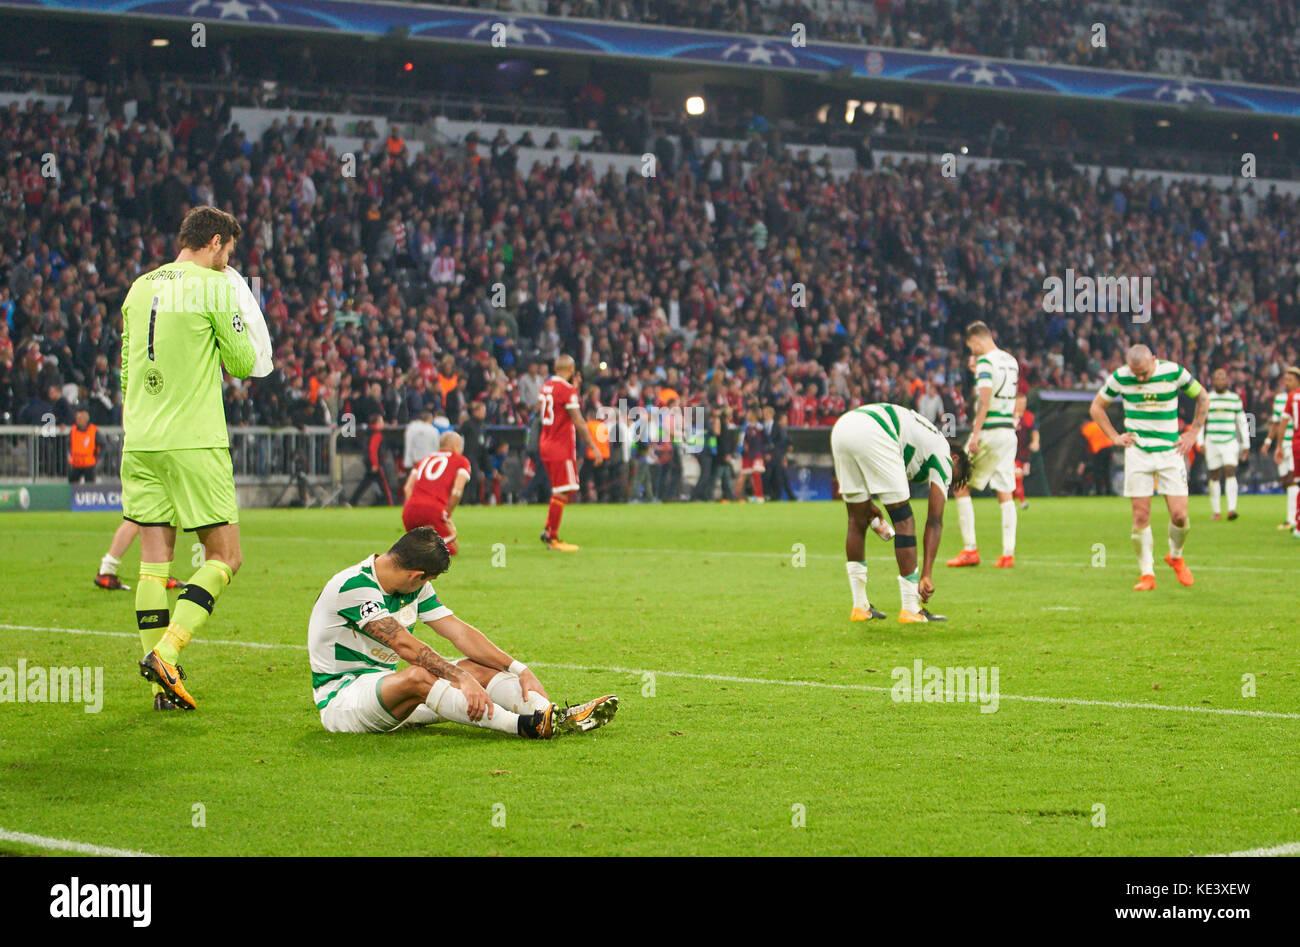 Munich, Germany. 18th Oct, 2017. FC Bayern Munich Soccer, Munich, October 18, 2017 Glasgow players unsatisfied Craig - Stock Image